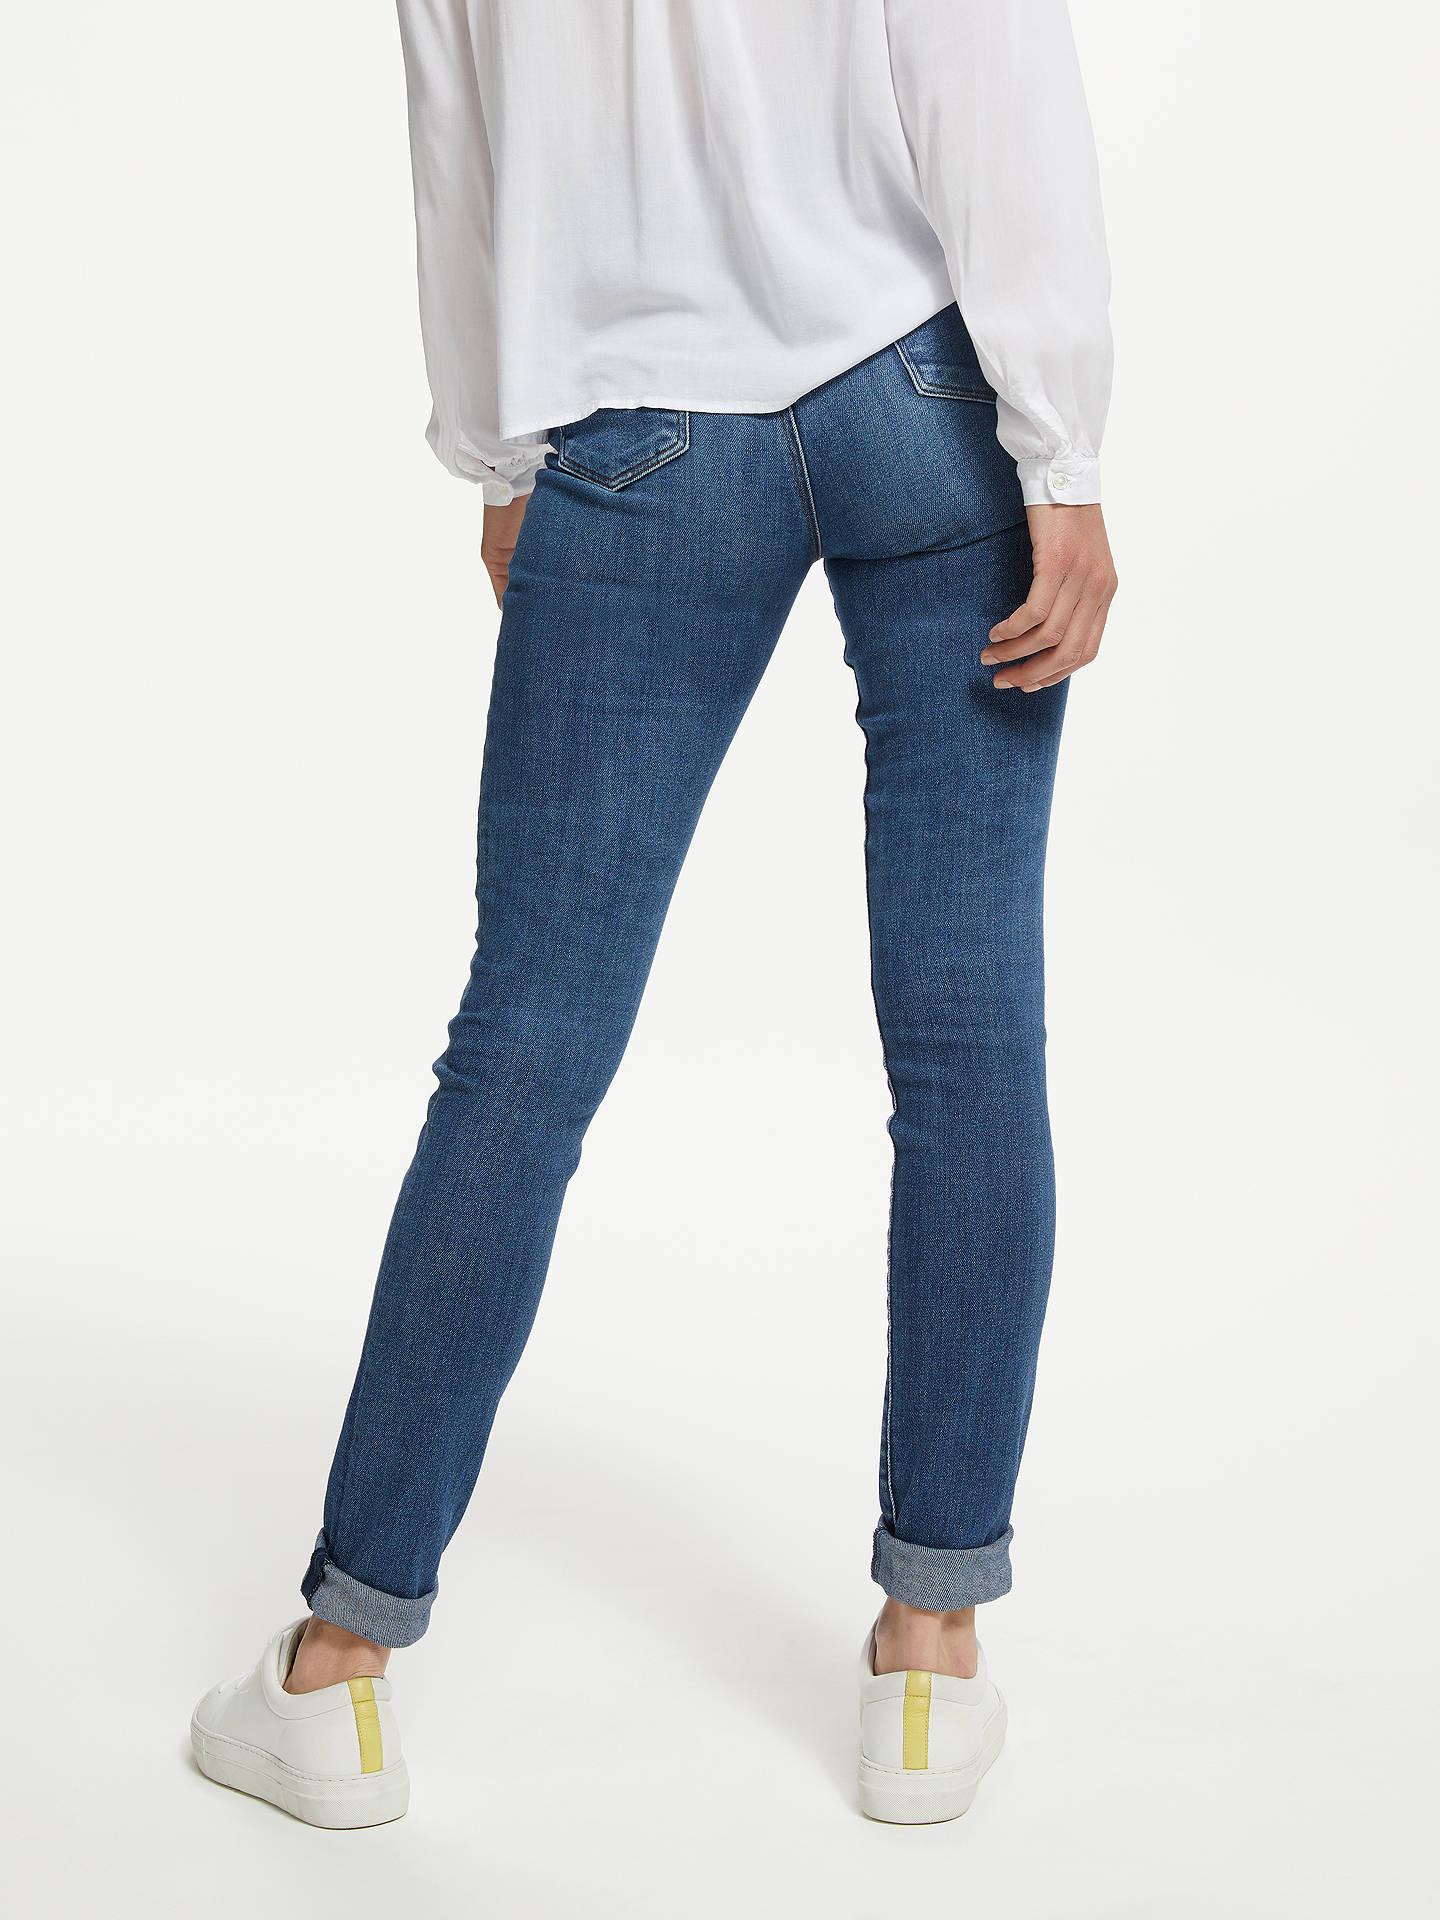 db6c026f9b2f0 ... Buy J Brand Carolina Super High Rise Skinny Jeans